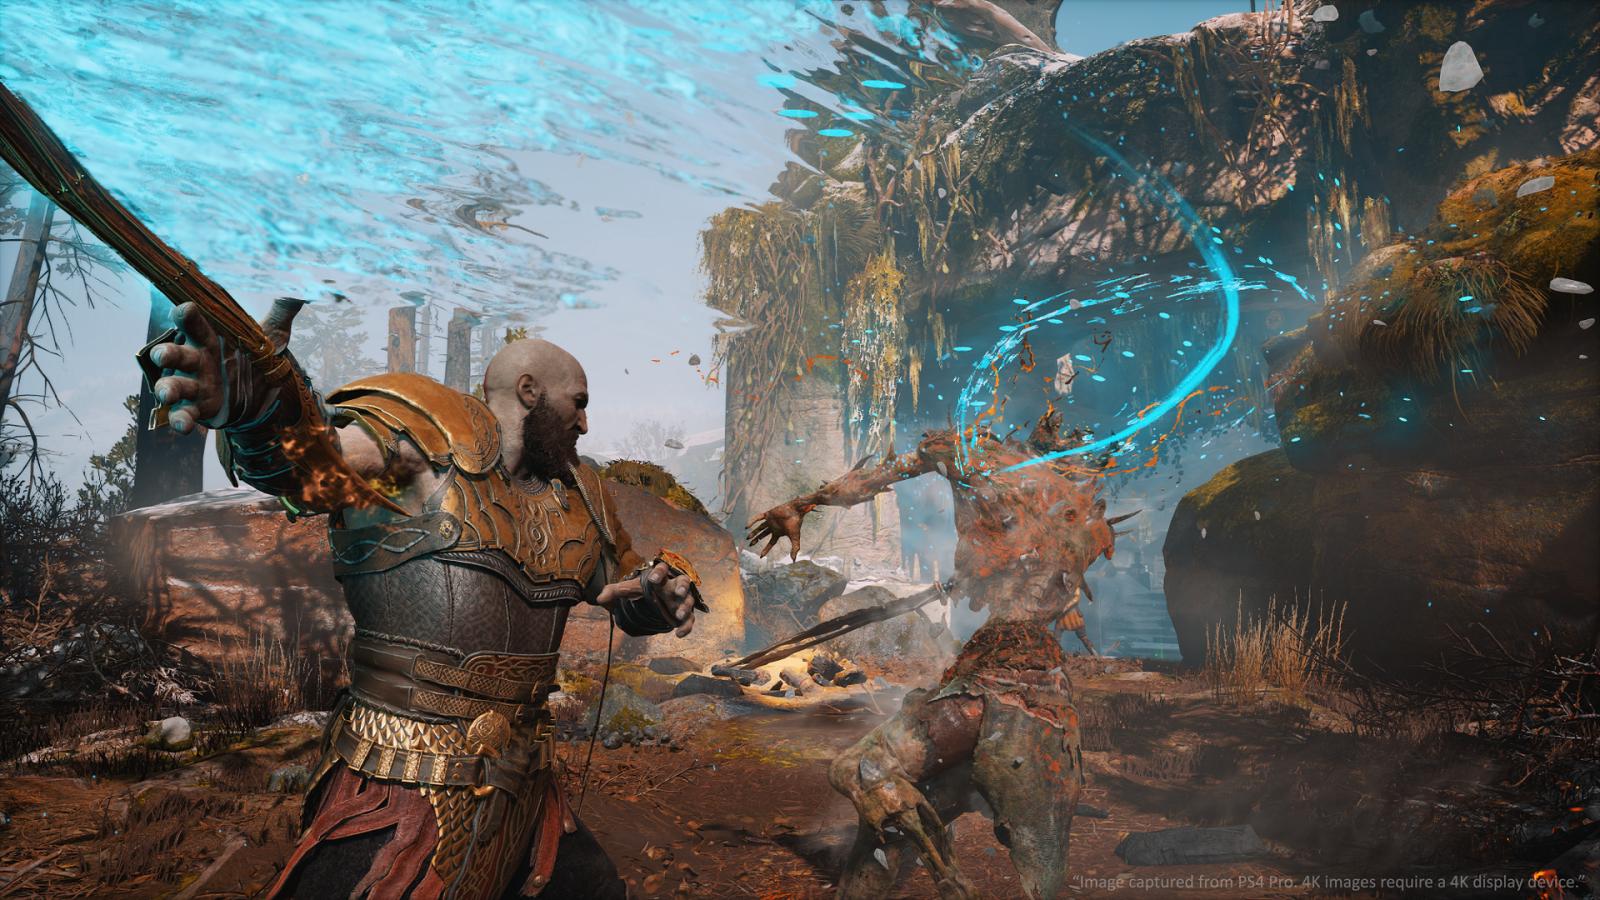 Todays Best Game Deals God Of War 35 Witcher 3 Complete 25 Ps4resident Evil 7 Reg More